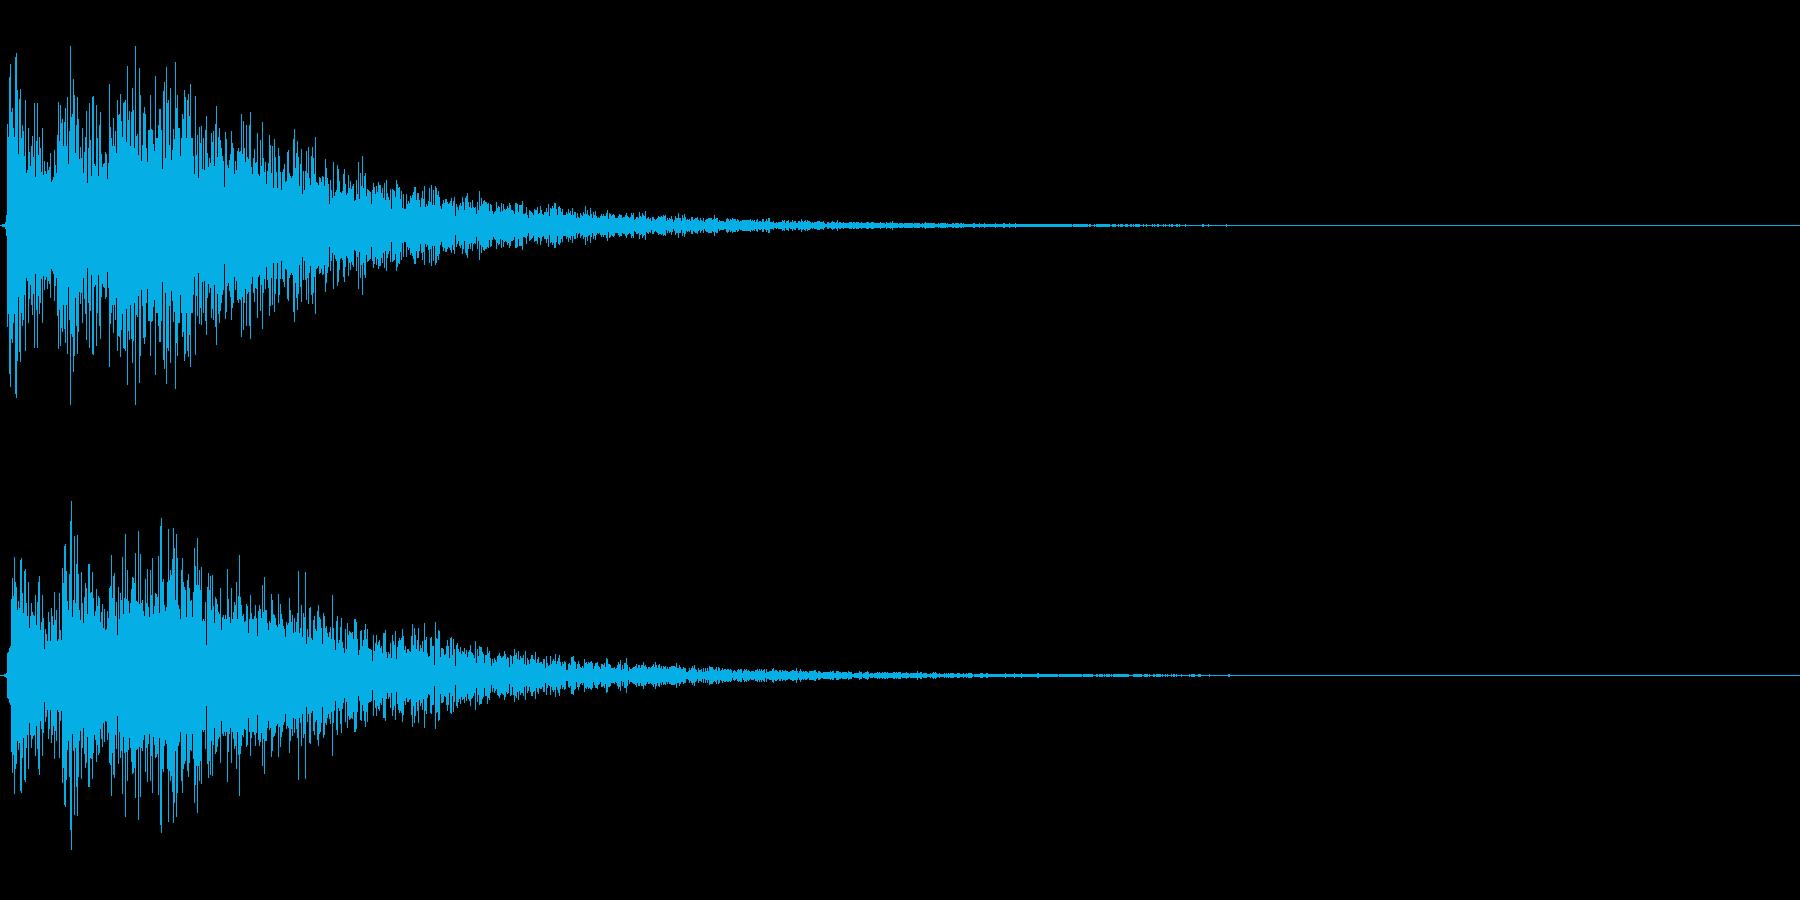 Dark_Attack-33_Delayの再生済みの波形